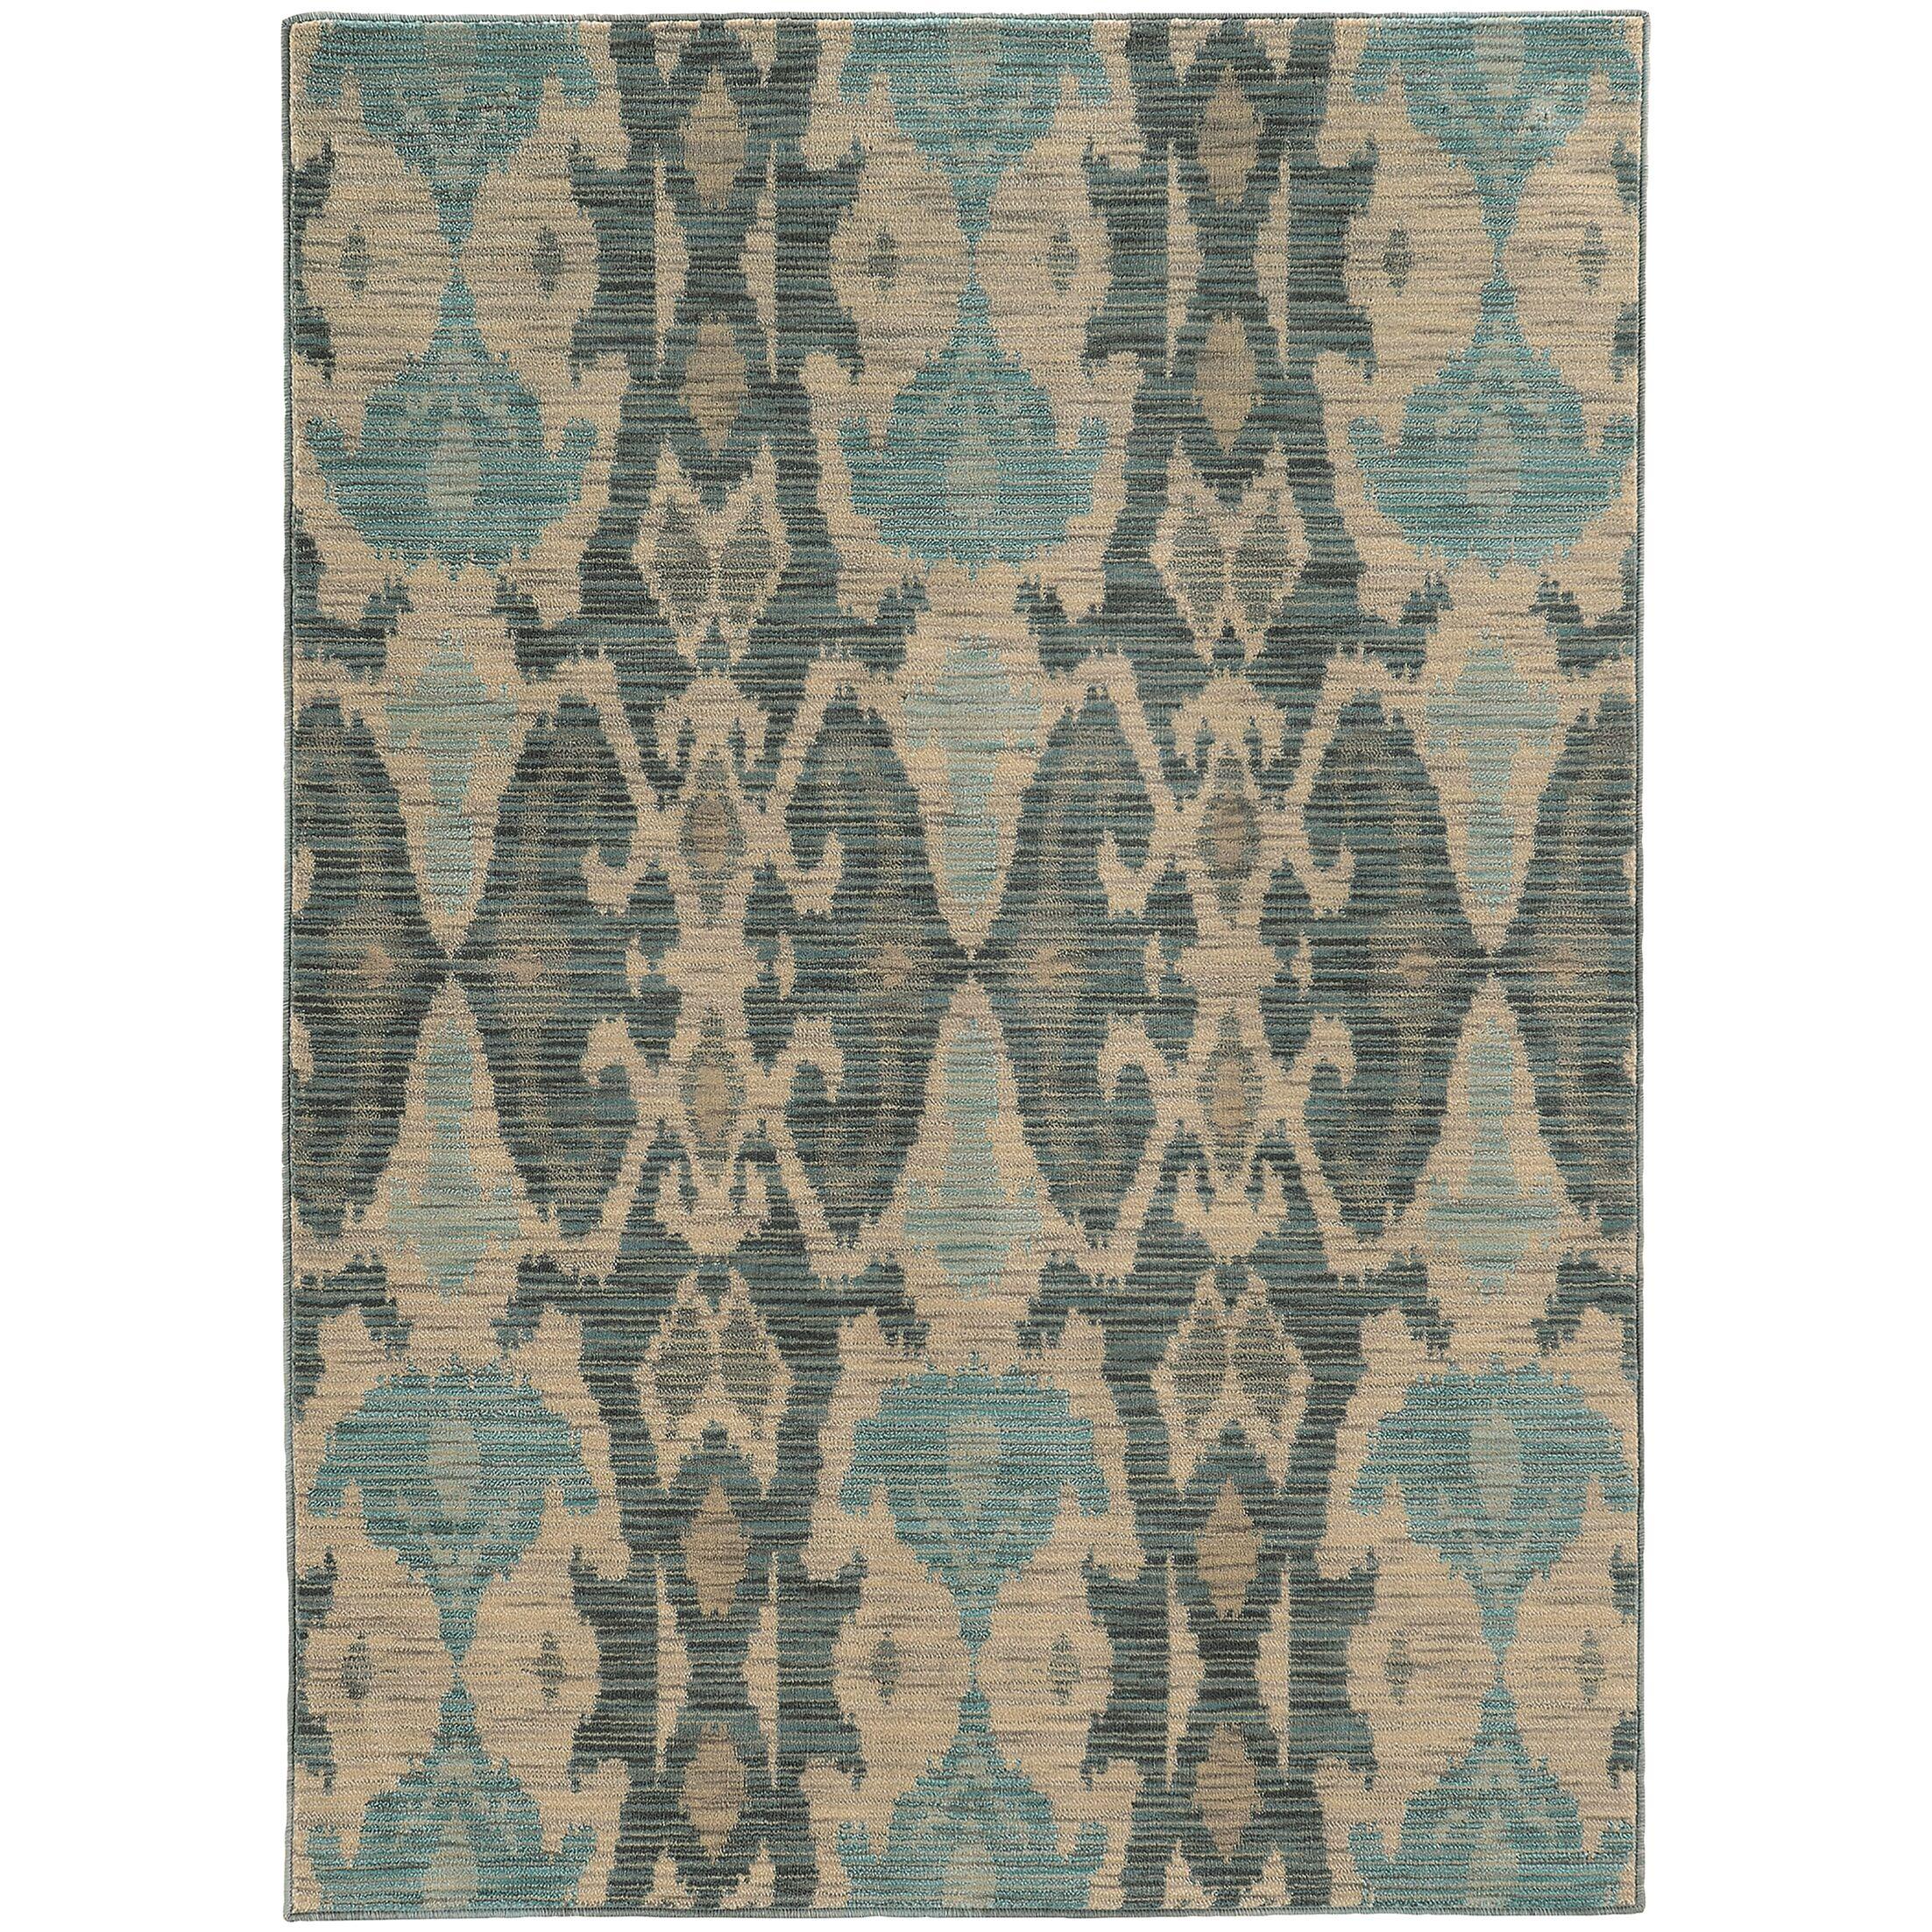 Aydan Ivory/Grey Area Rug Rug Size: Rectangle 7'10